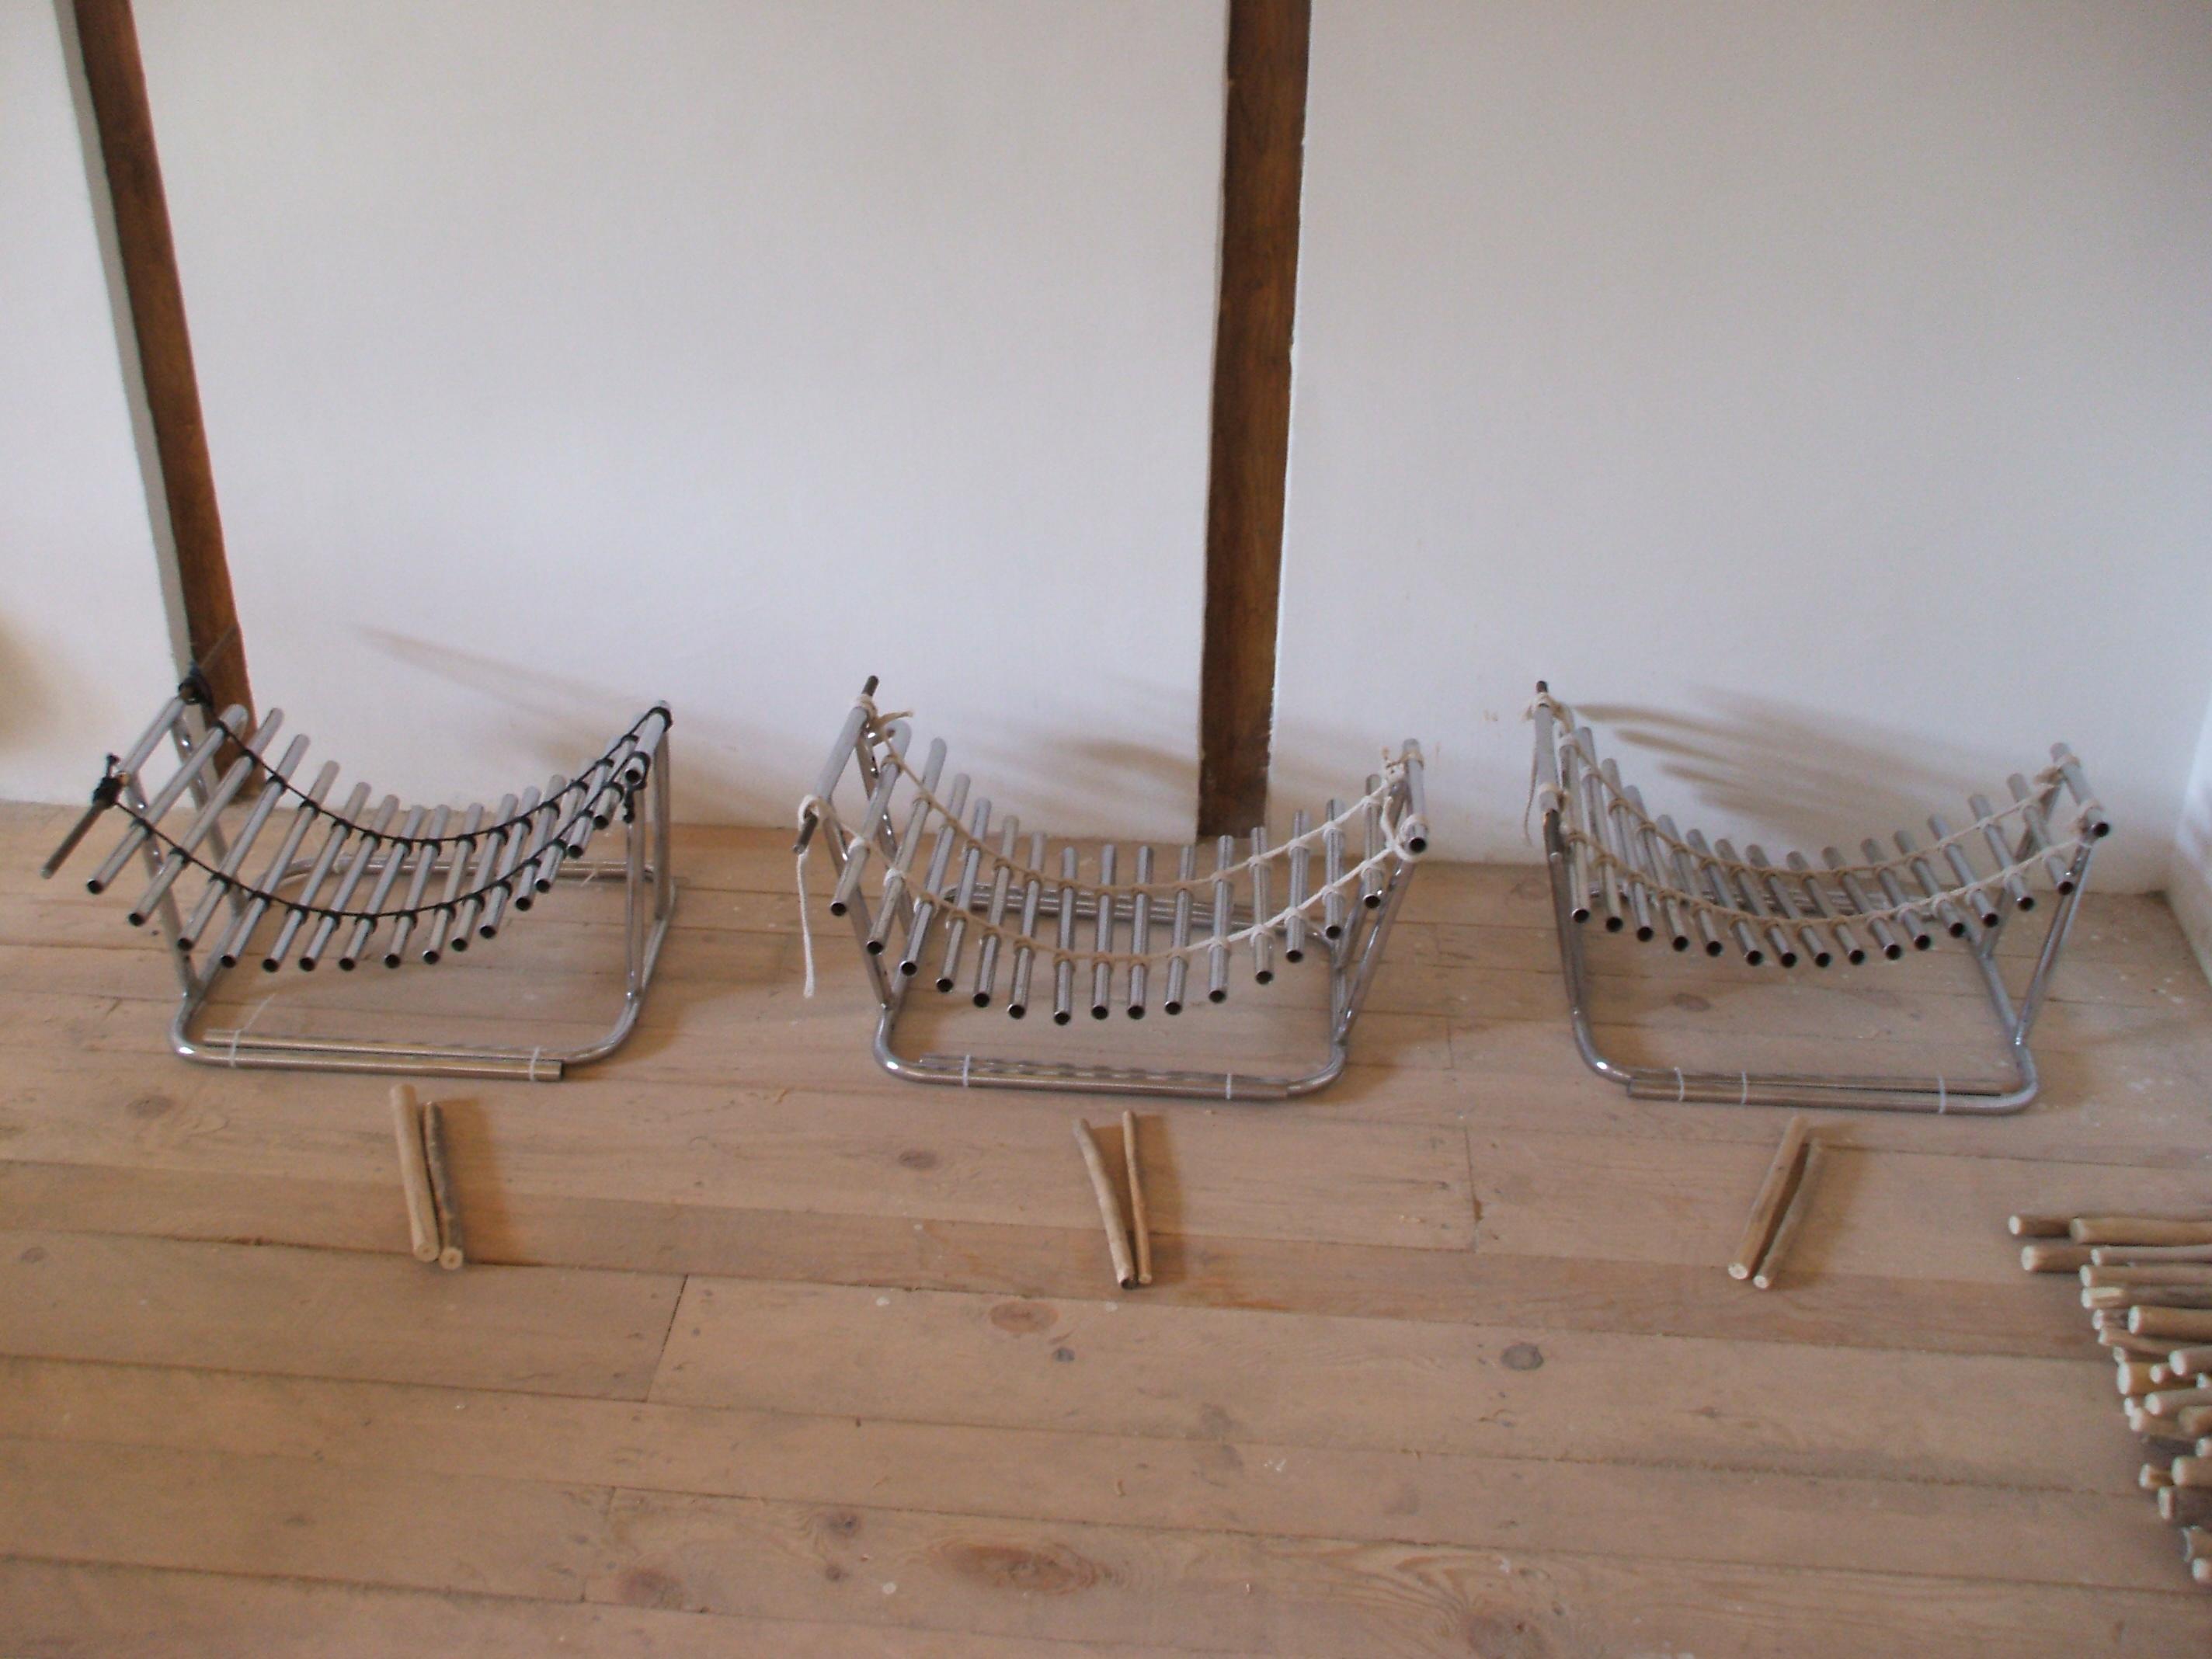 3 metallophones made from broken chair legs